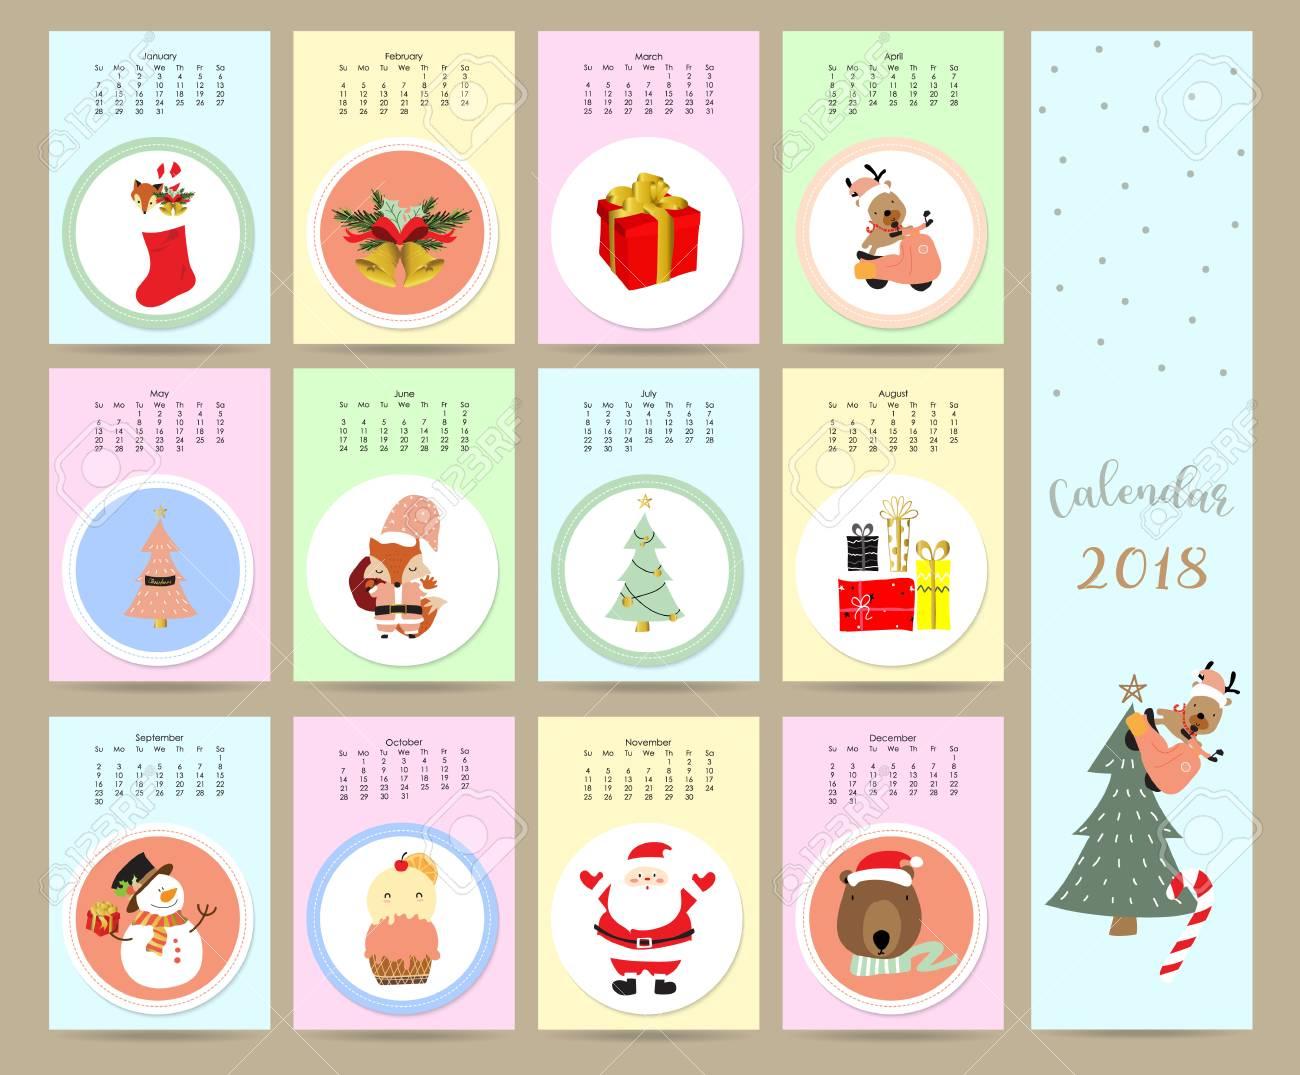 Calendario Fox.Colorful Cute Monthly Calendar 2018 With Wild Fox Bear Snowman Gift Christmas